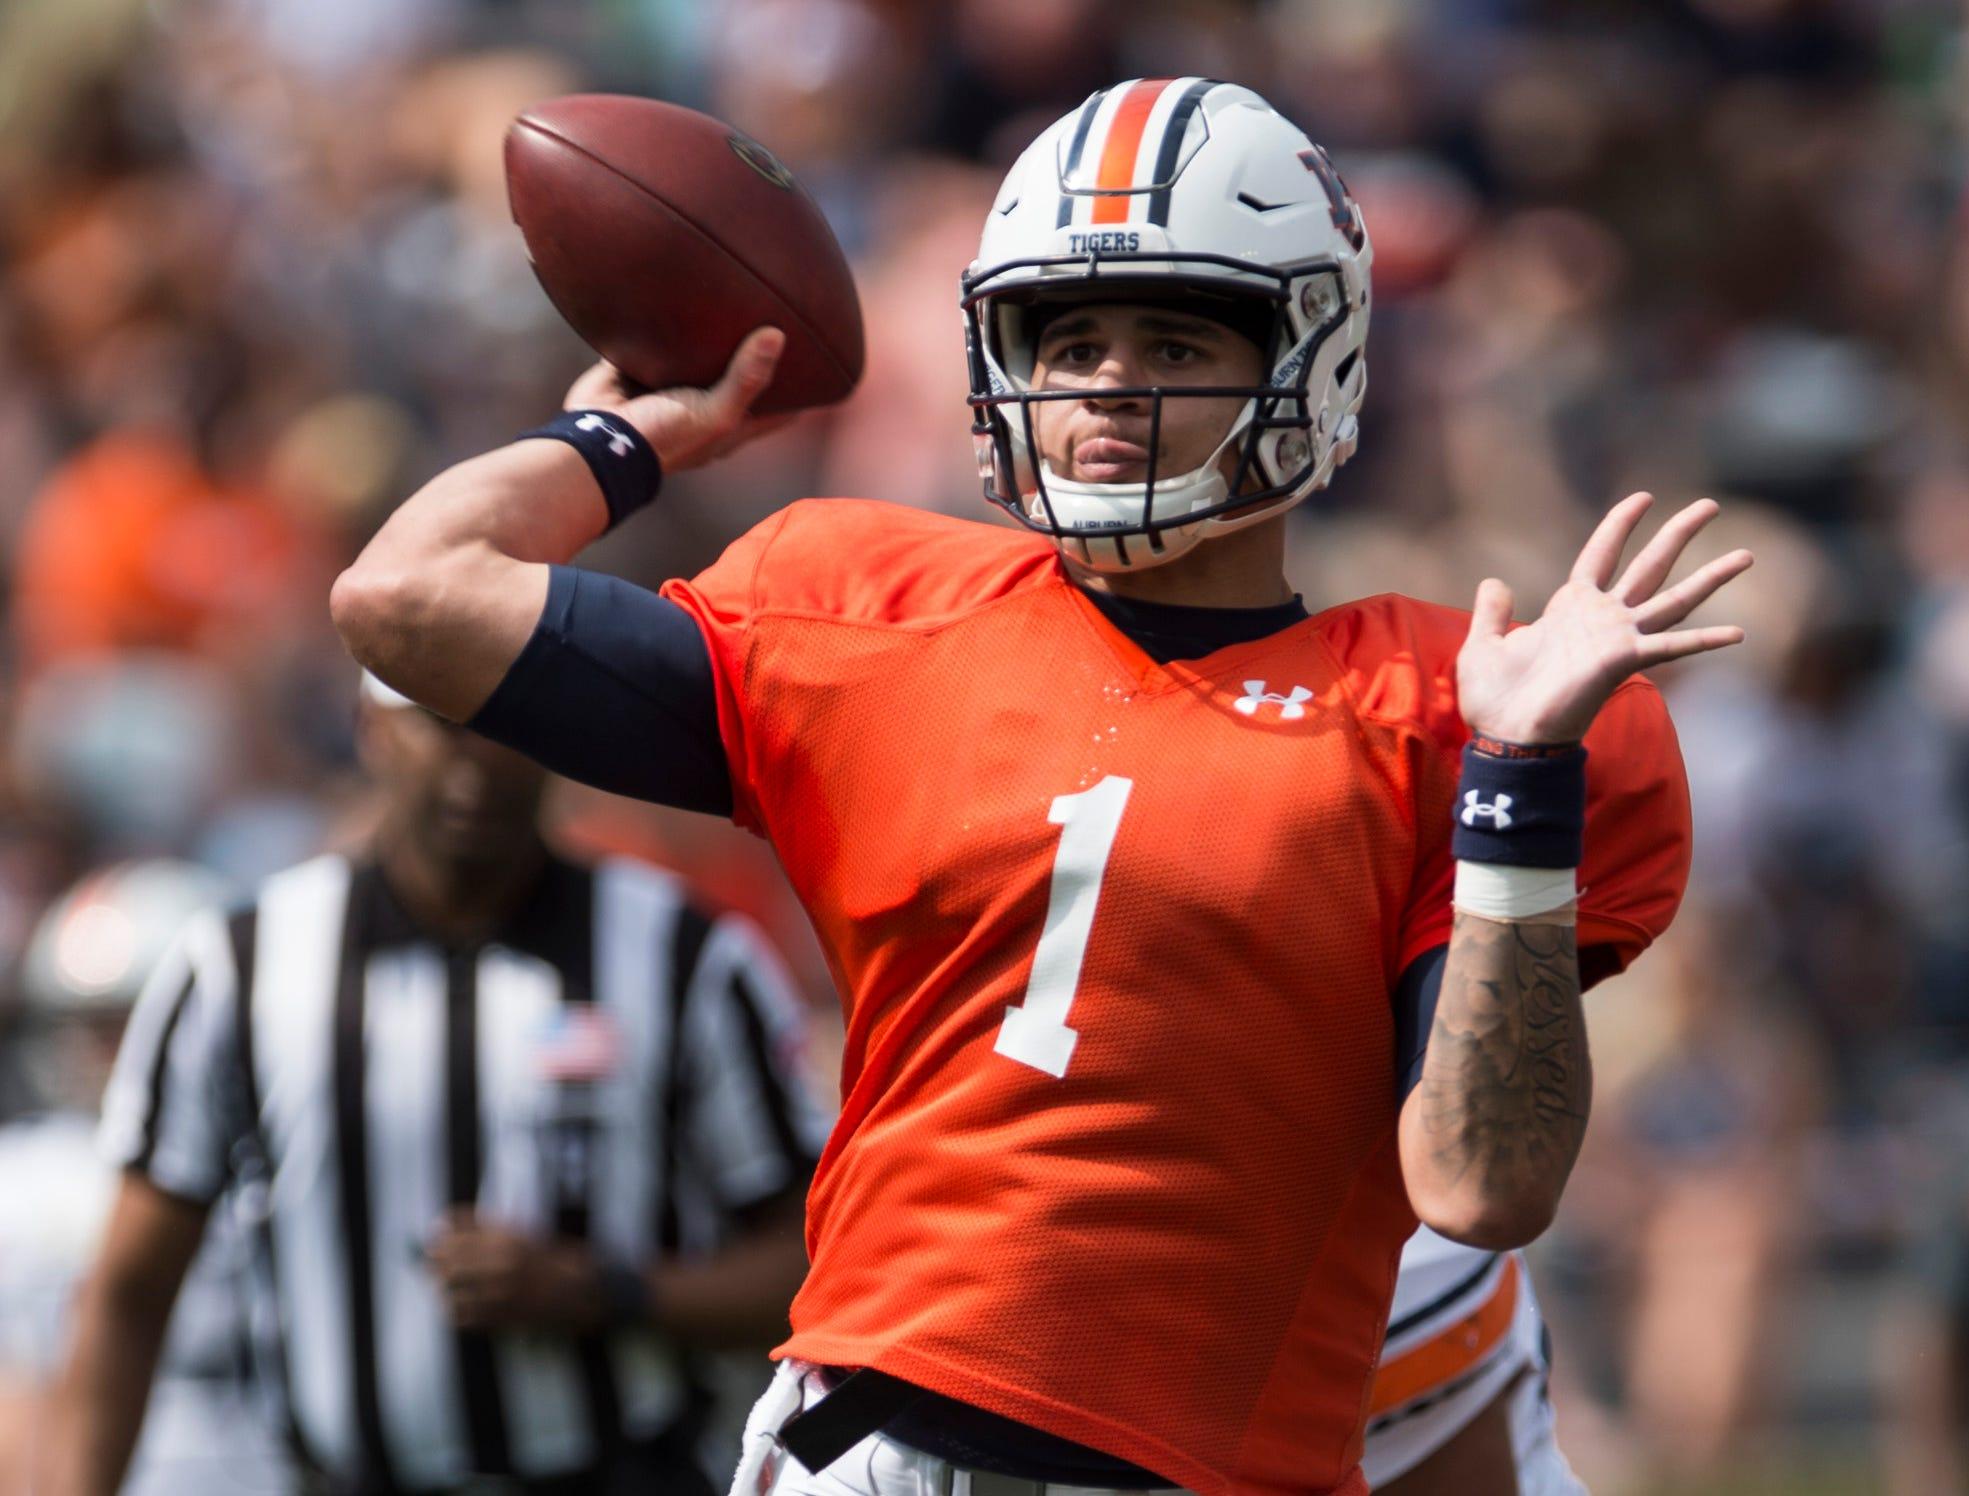 Auburn quarterback Joey Gatewood (1) throws the ball during the A-Day spring practice gameat Jordan-Hare Stadium in Auburn, Ala., on Saturday, April 13, 2019.